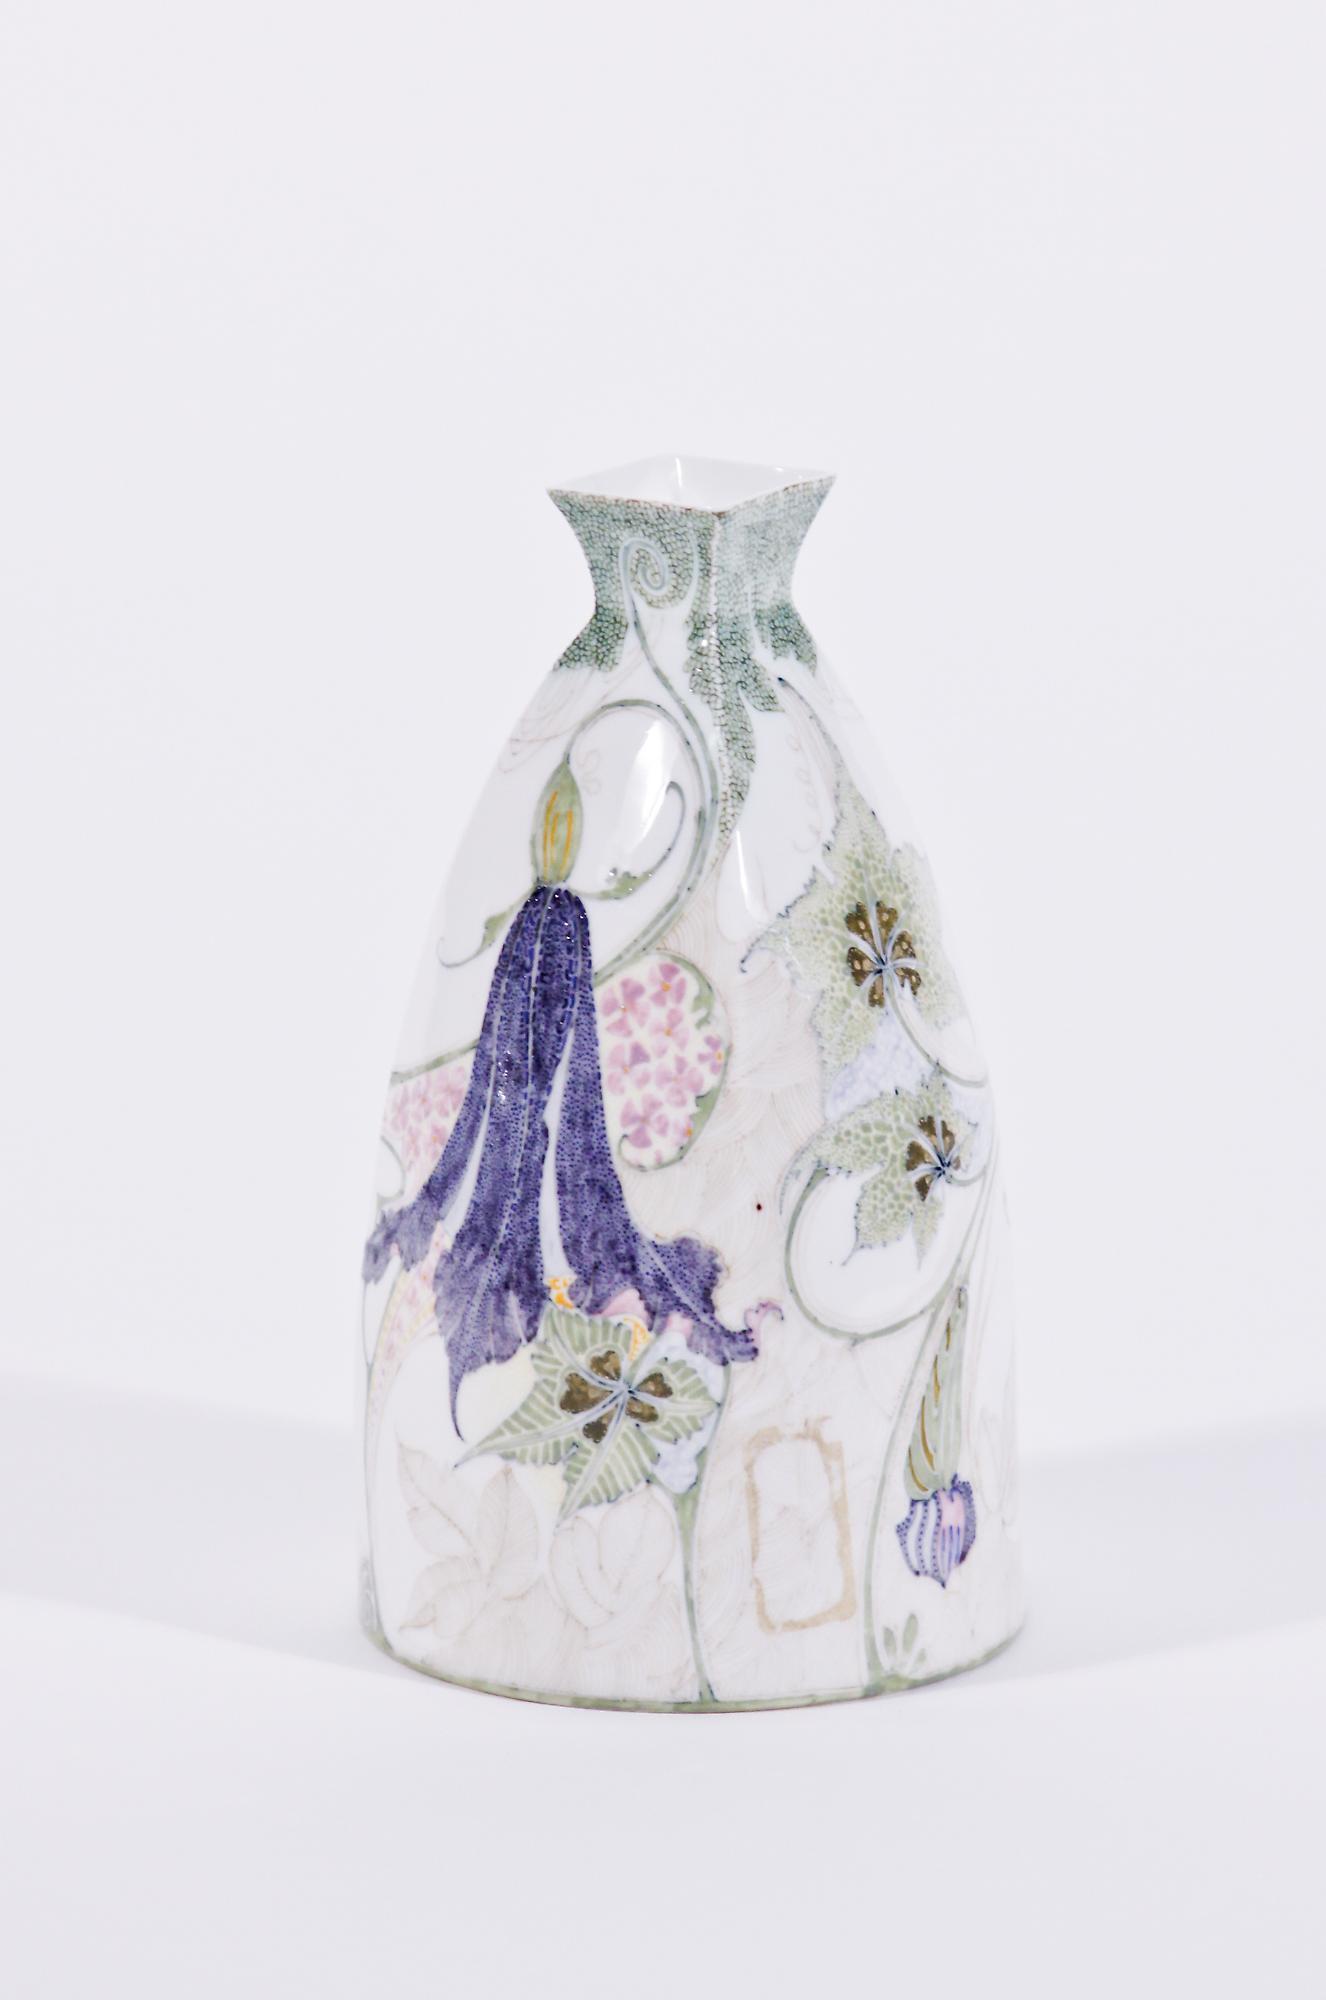 Rozenburg den Haag  Porcelain Bud Vase 1